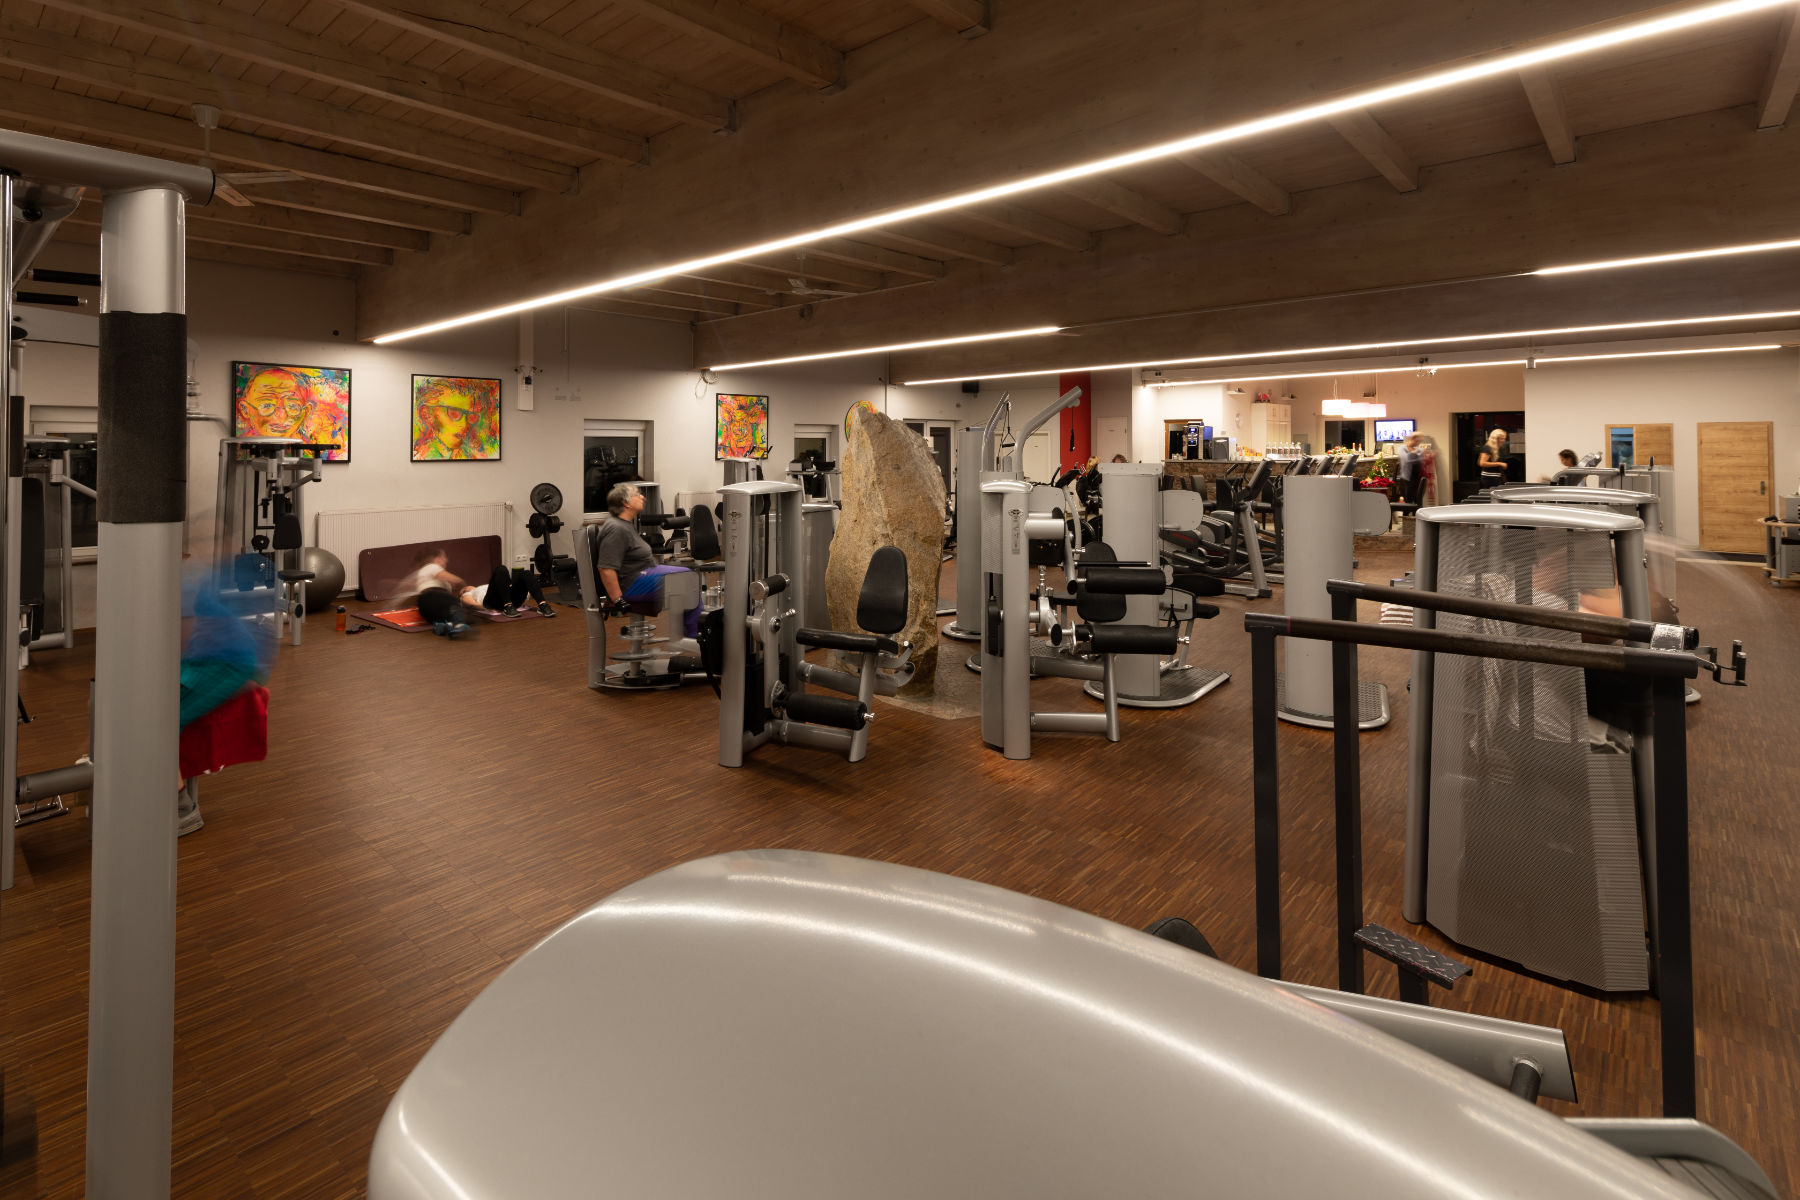 Studio Hirschmann Health & Fitness